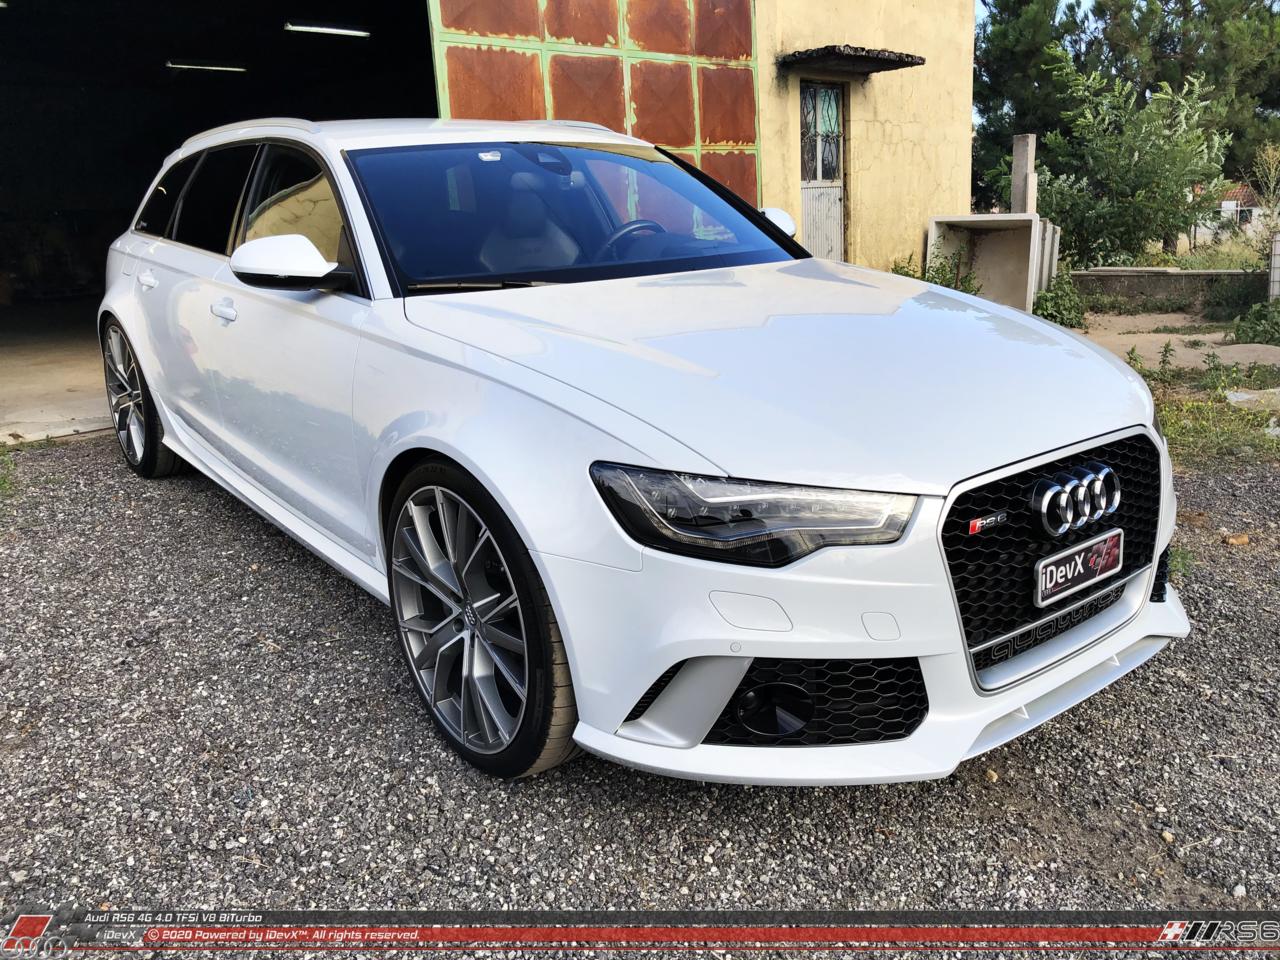 05_08.2019_Audi-RS6_iDevX_056.png